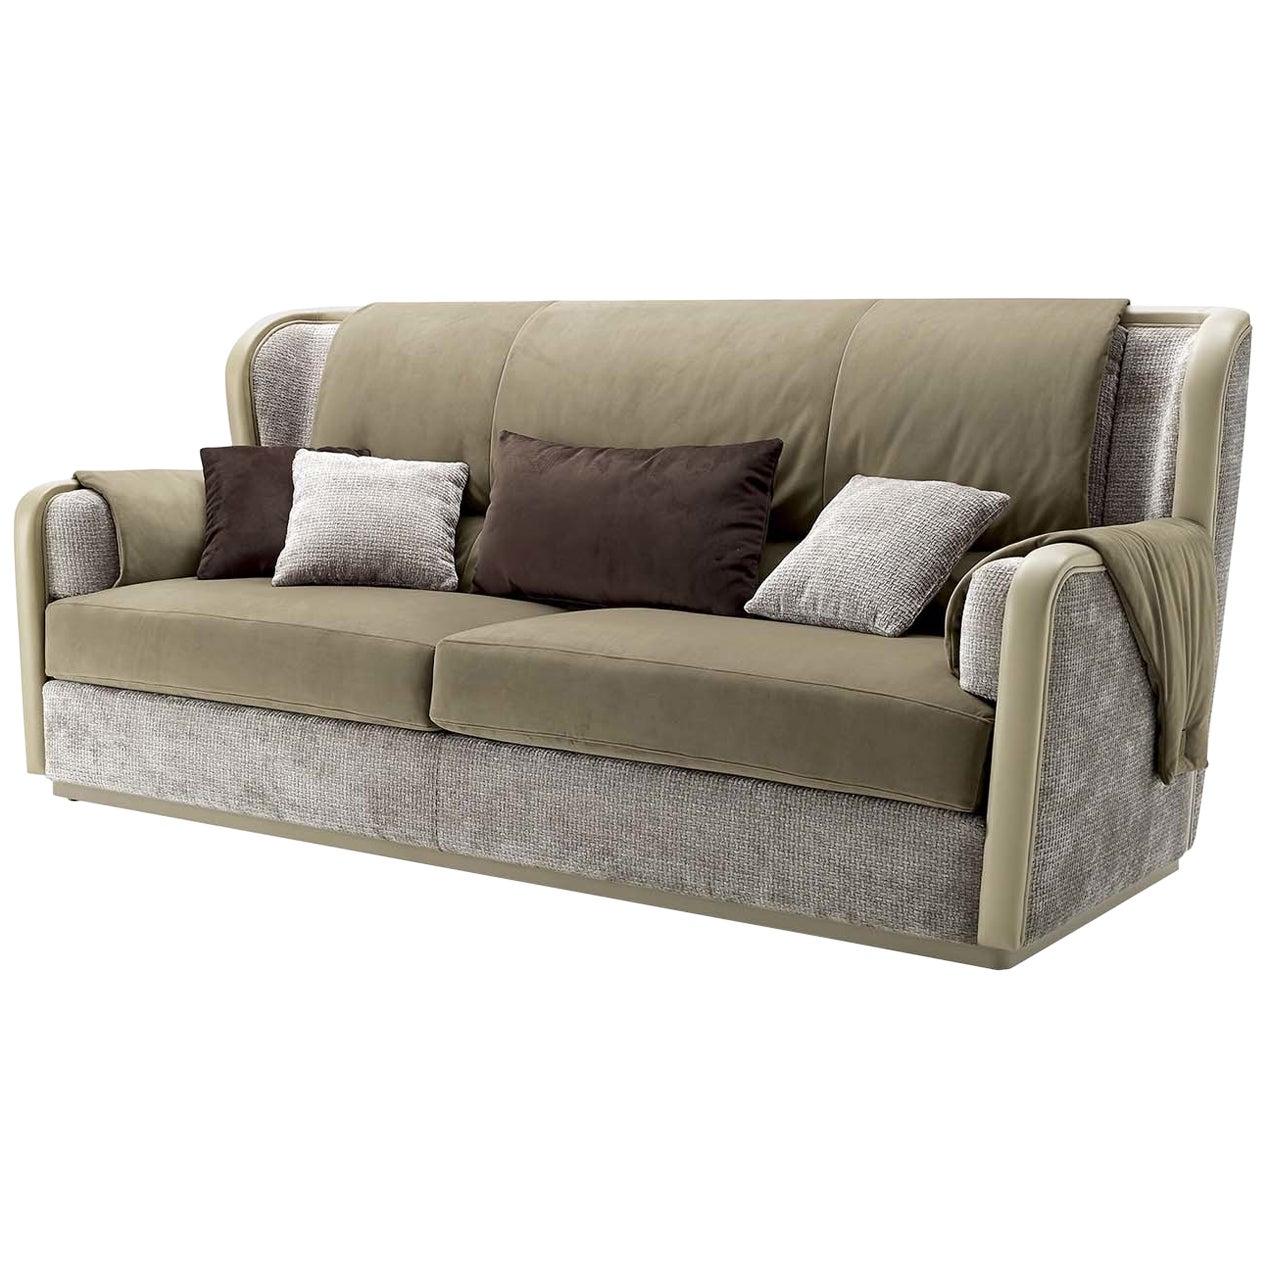 Beige Leather and Velvet 3-Seat Sofa